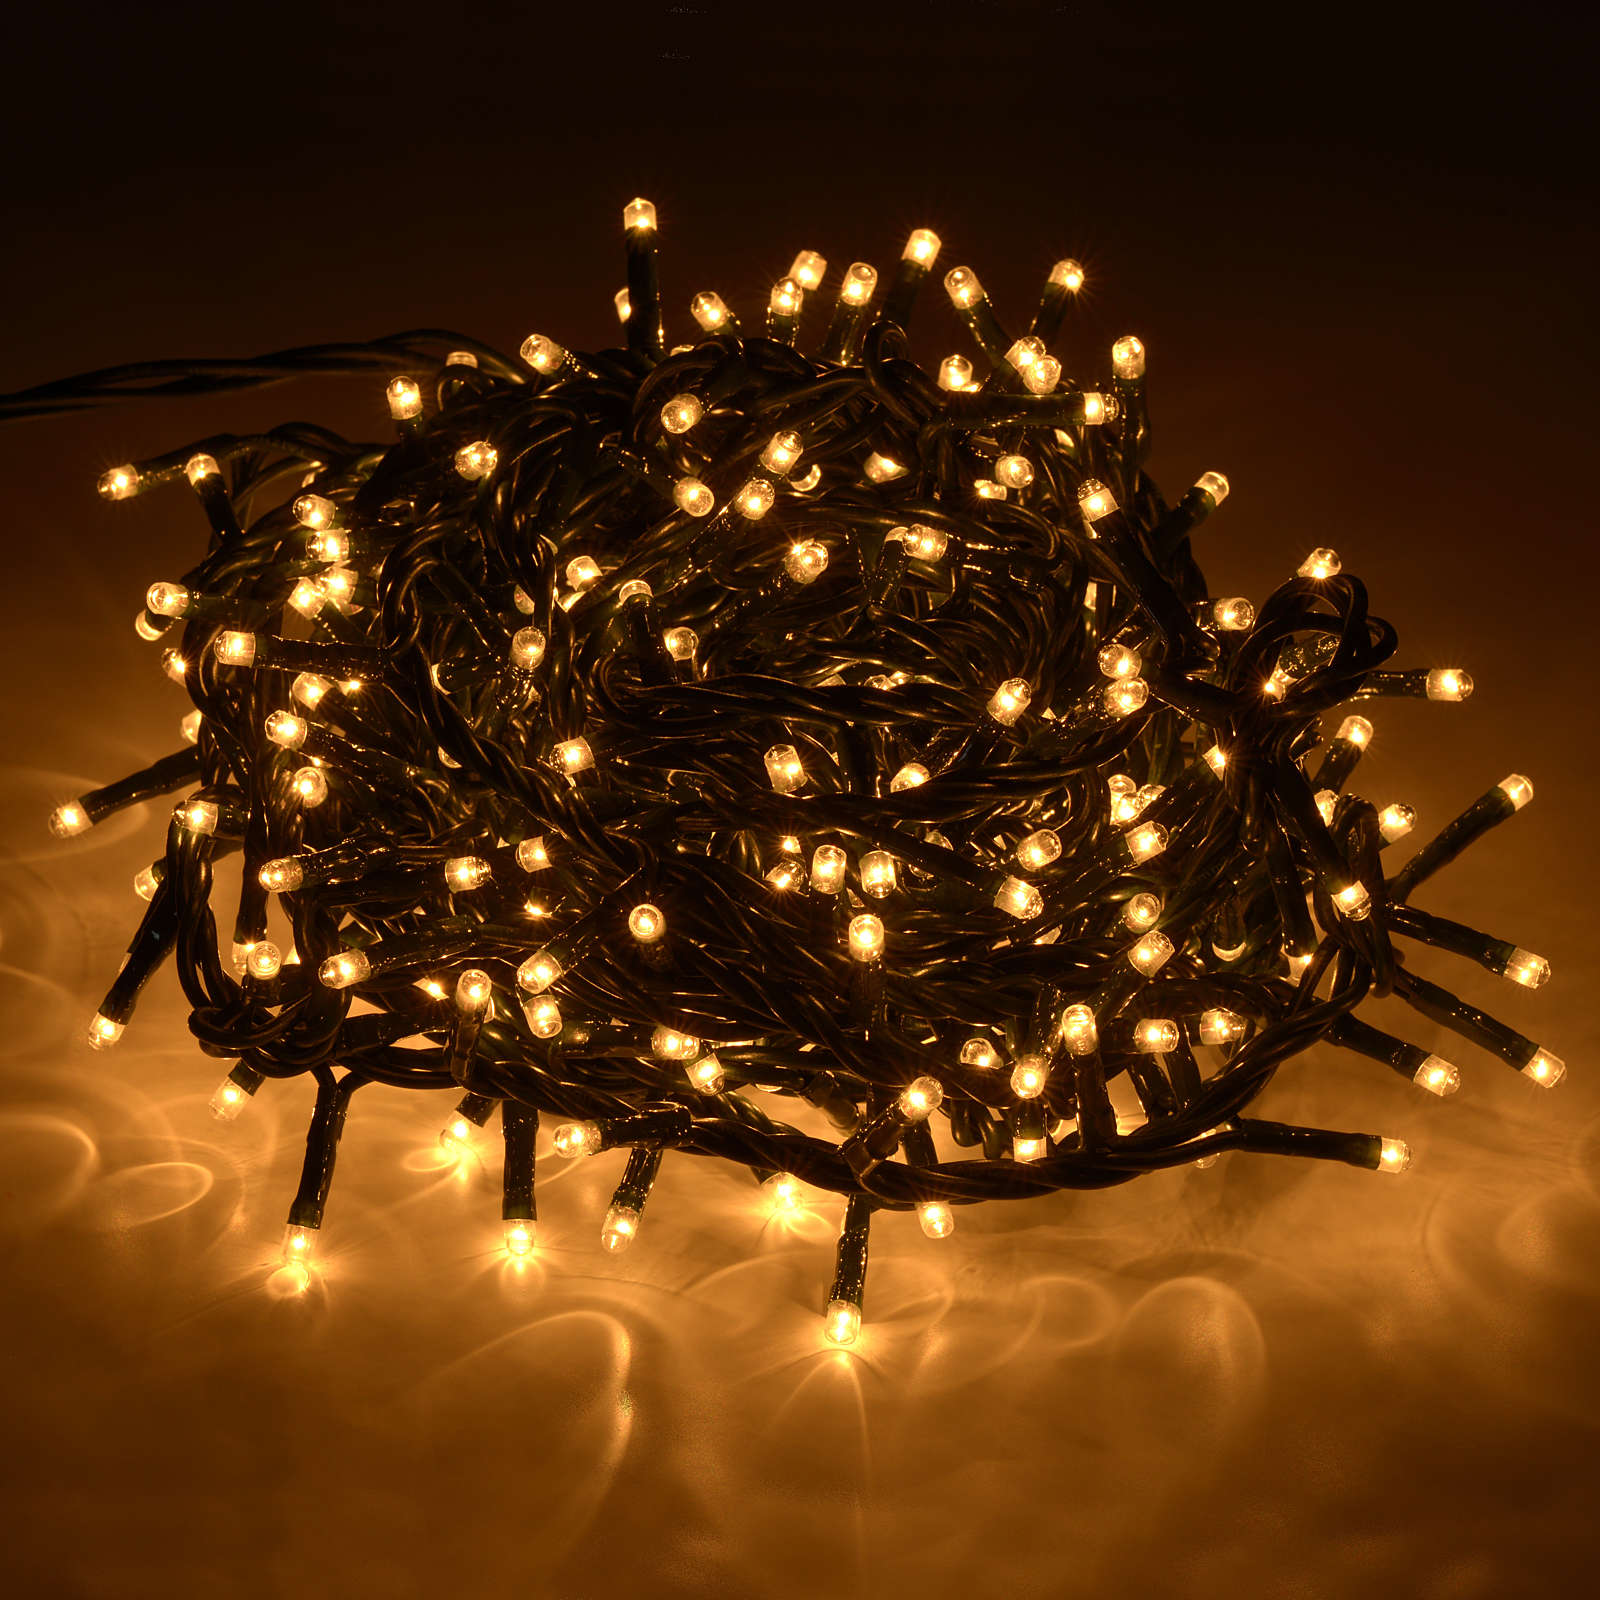 Christmas lights 300 mini lights, fair colour, for indoor use 3